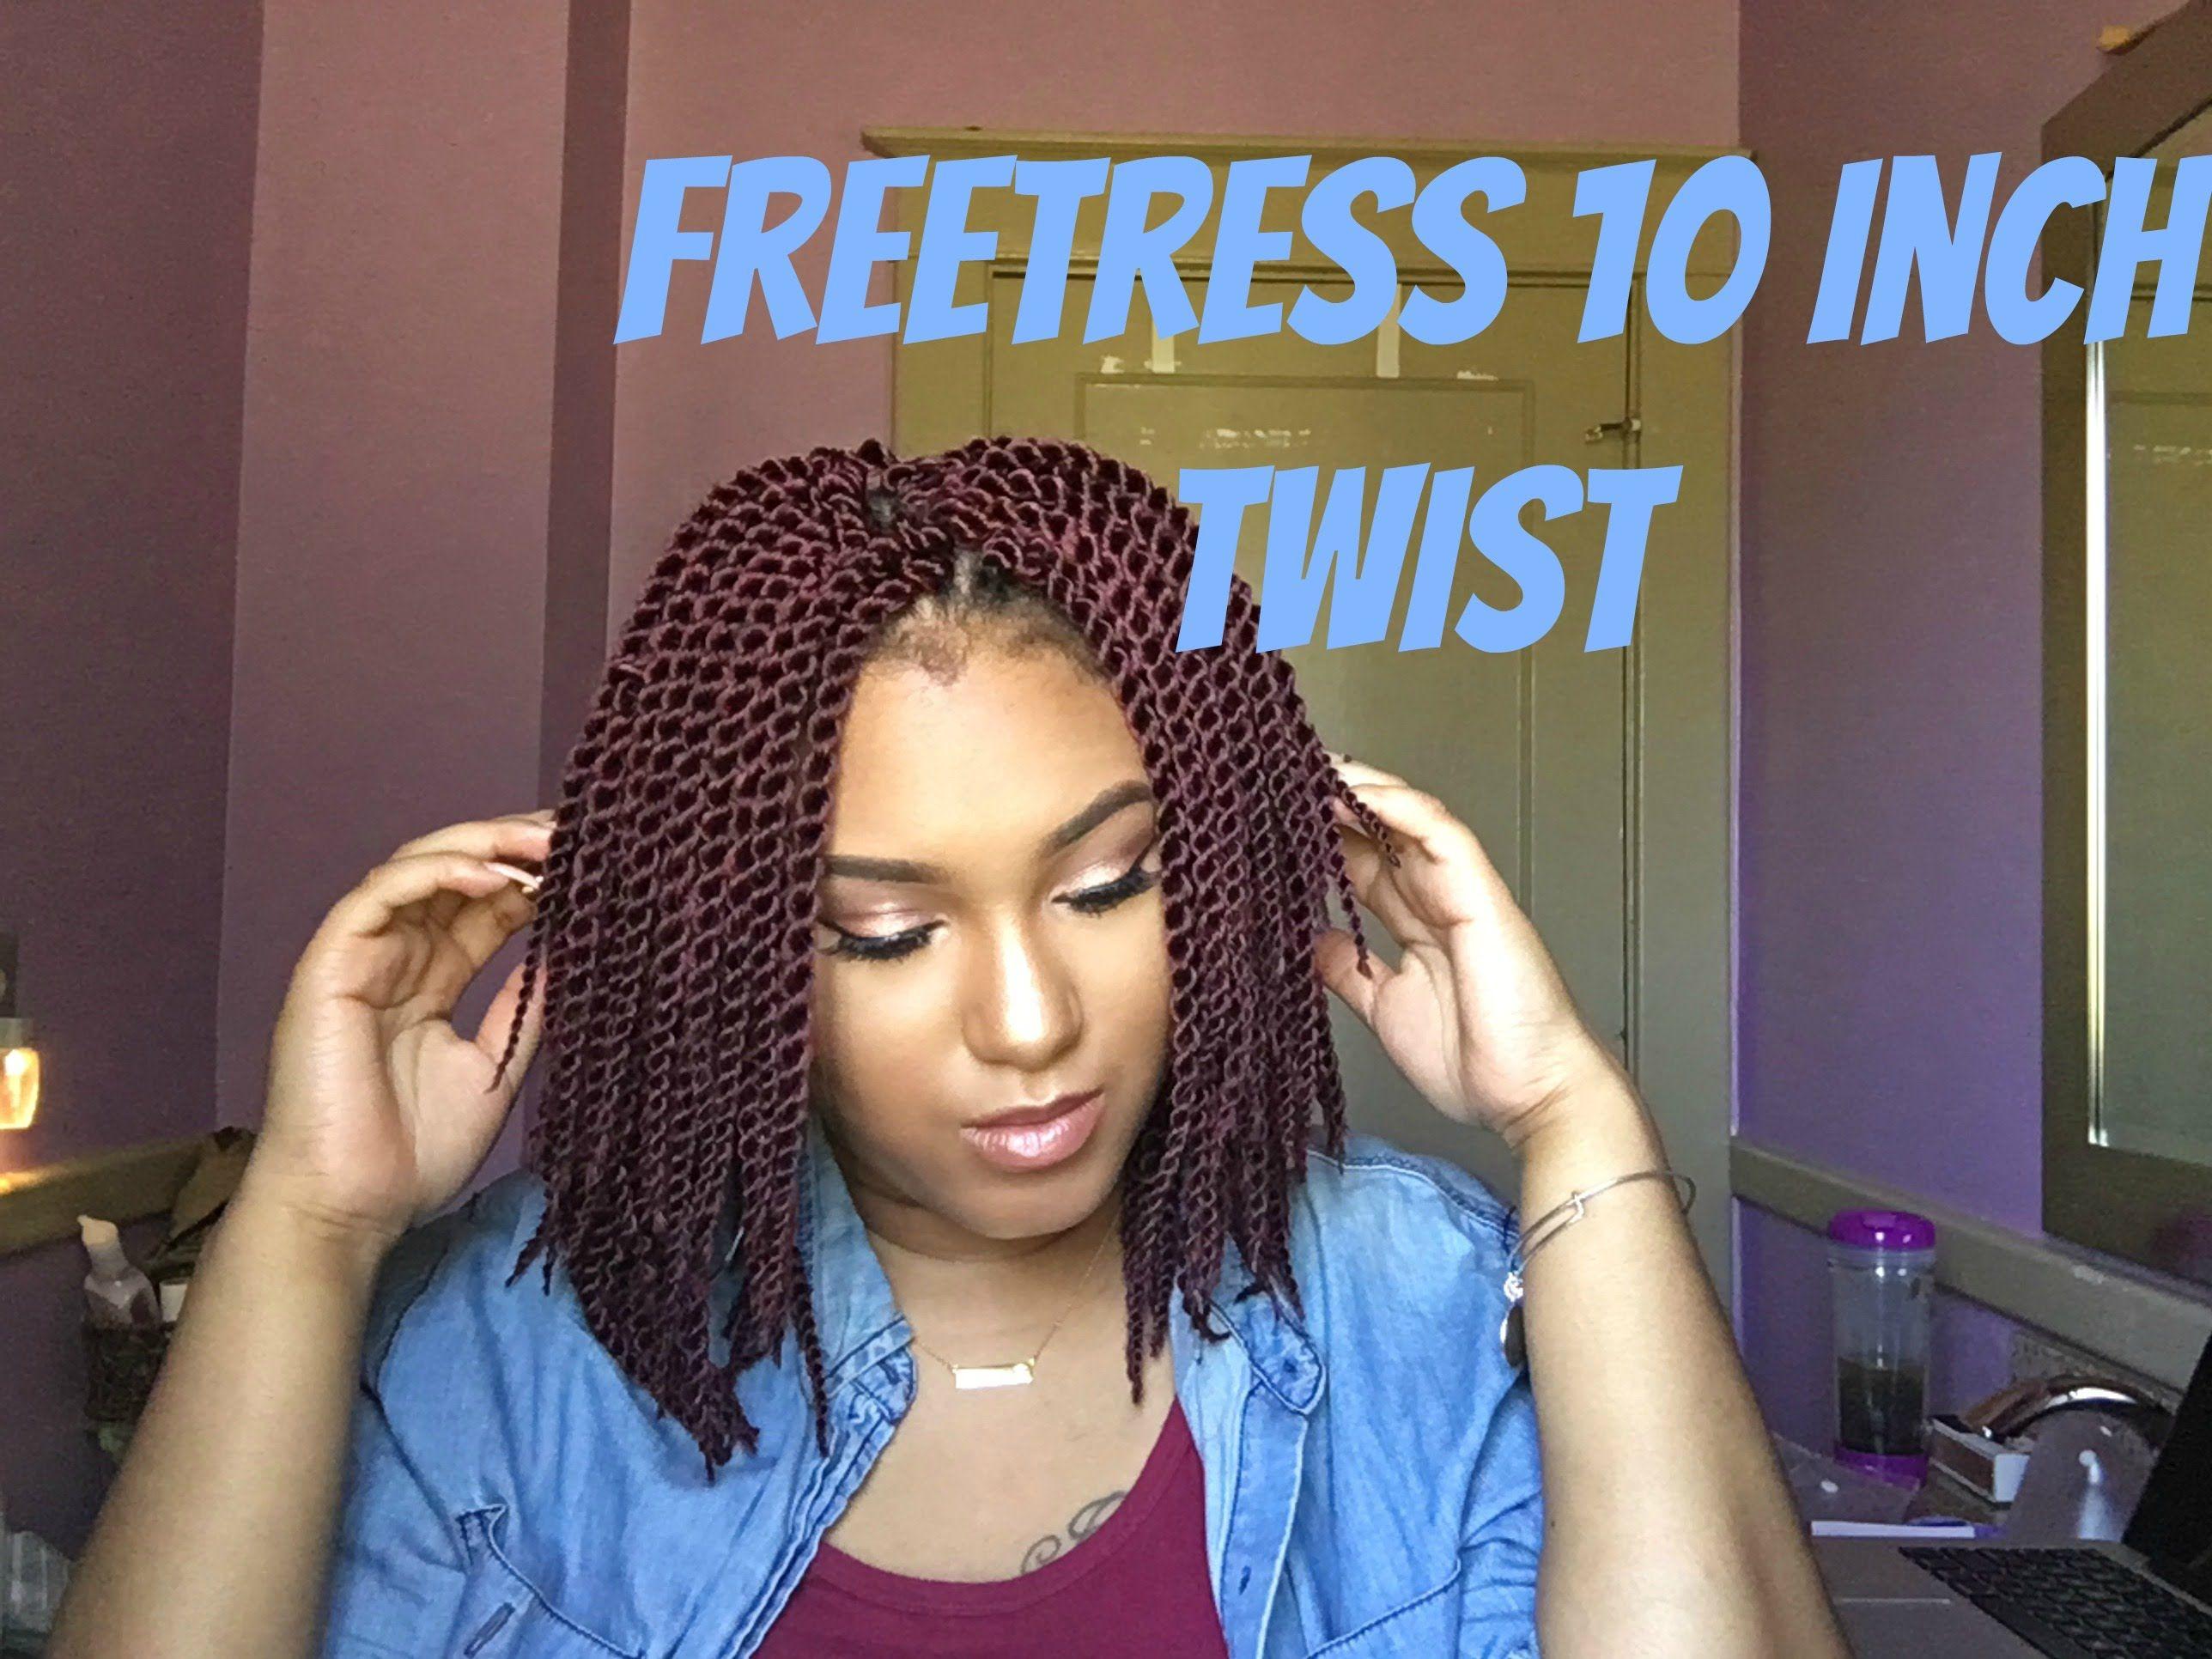 Crochet braids w freetress single twist 10inch theharelife my youtube channel pinterest - Crochet braids twist ...